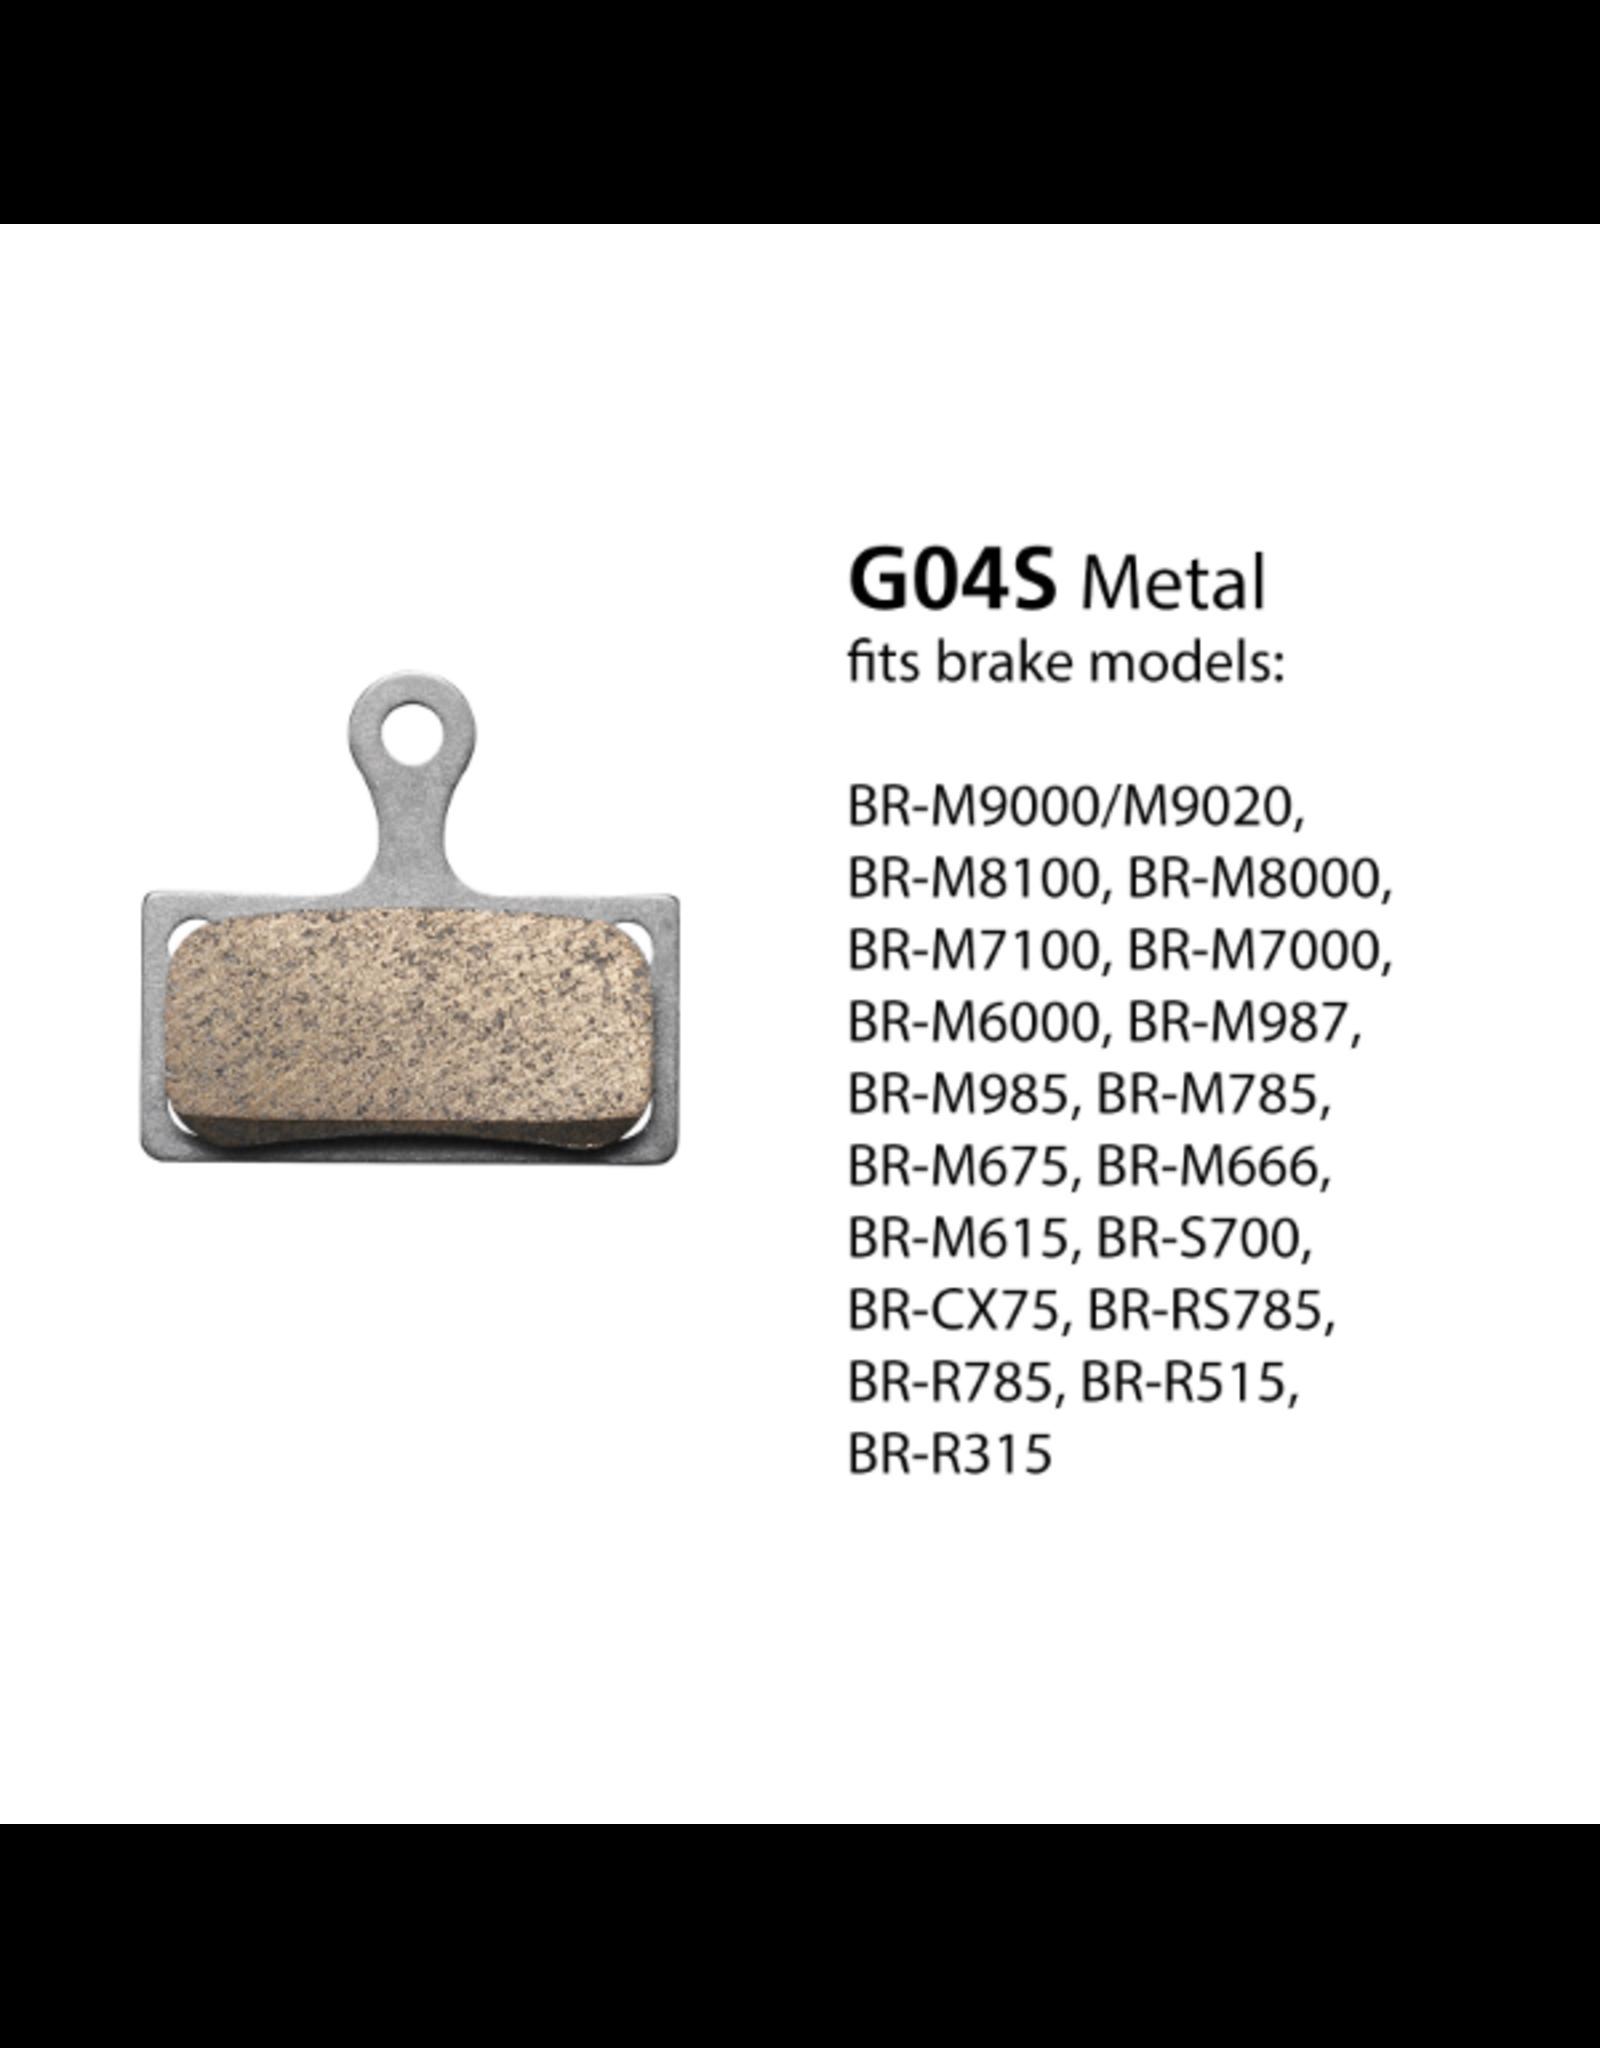 Shimano SHIMANO BR-M8000/9000 G04S METAL DISC BRAKE PADS XT/SLX